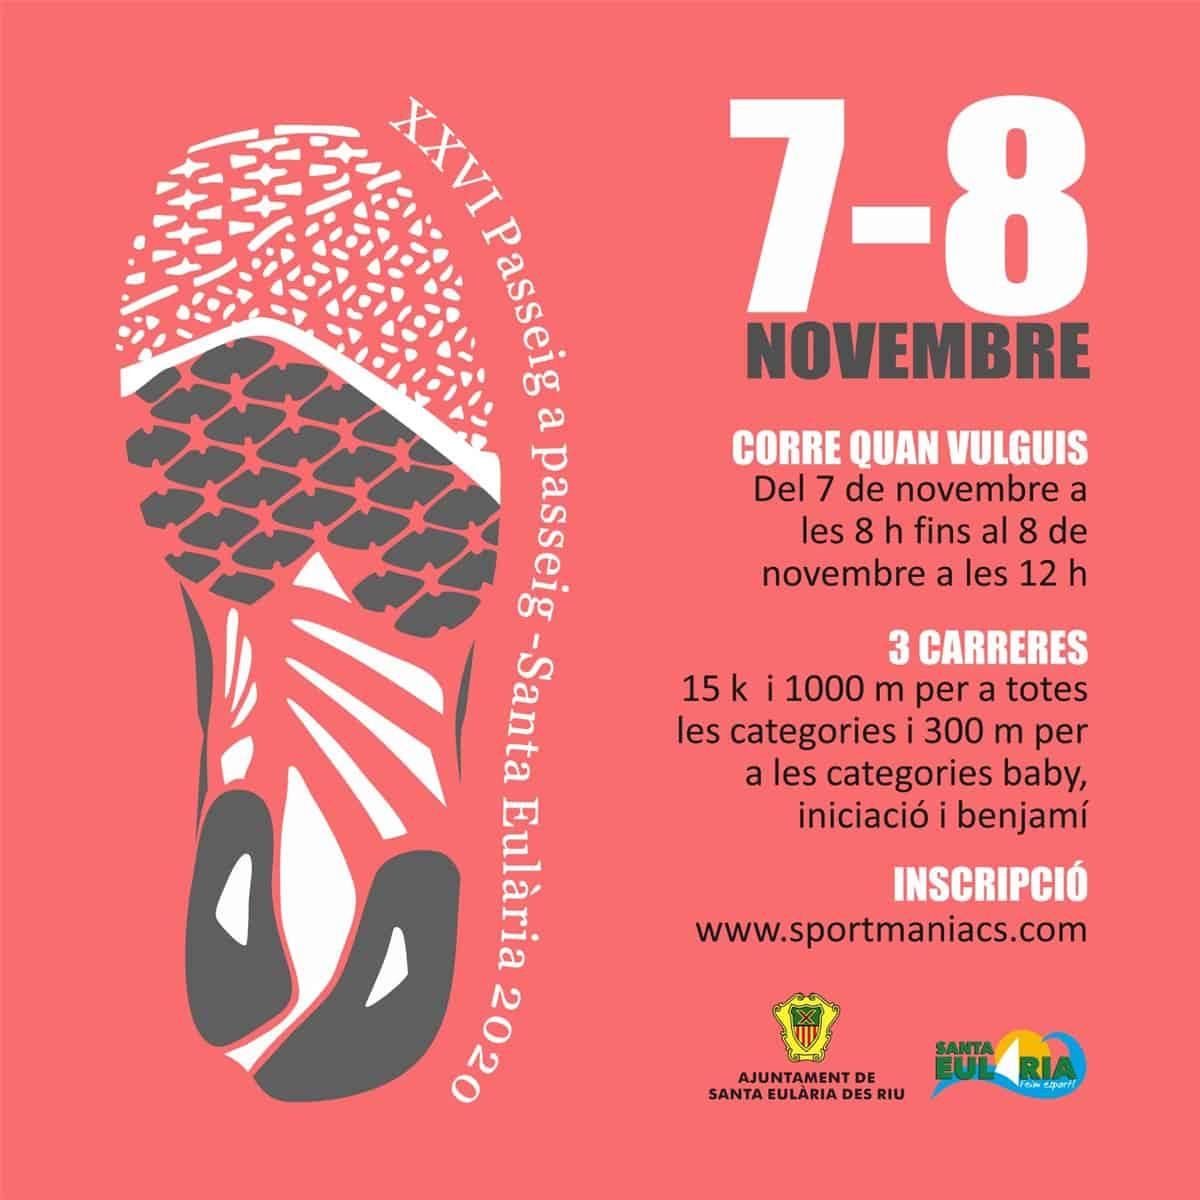 xxvi-cursa-de-passeig-a-passeig-santa-eulalia-ibiza-2020-welcometoibiza